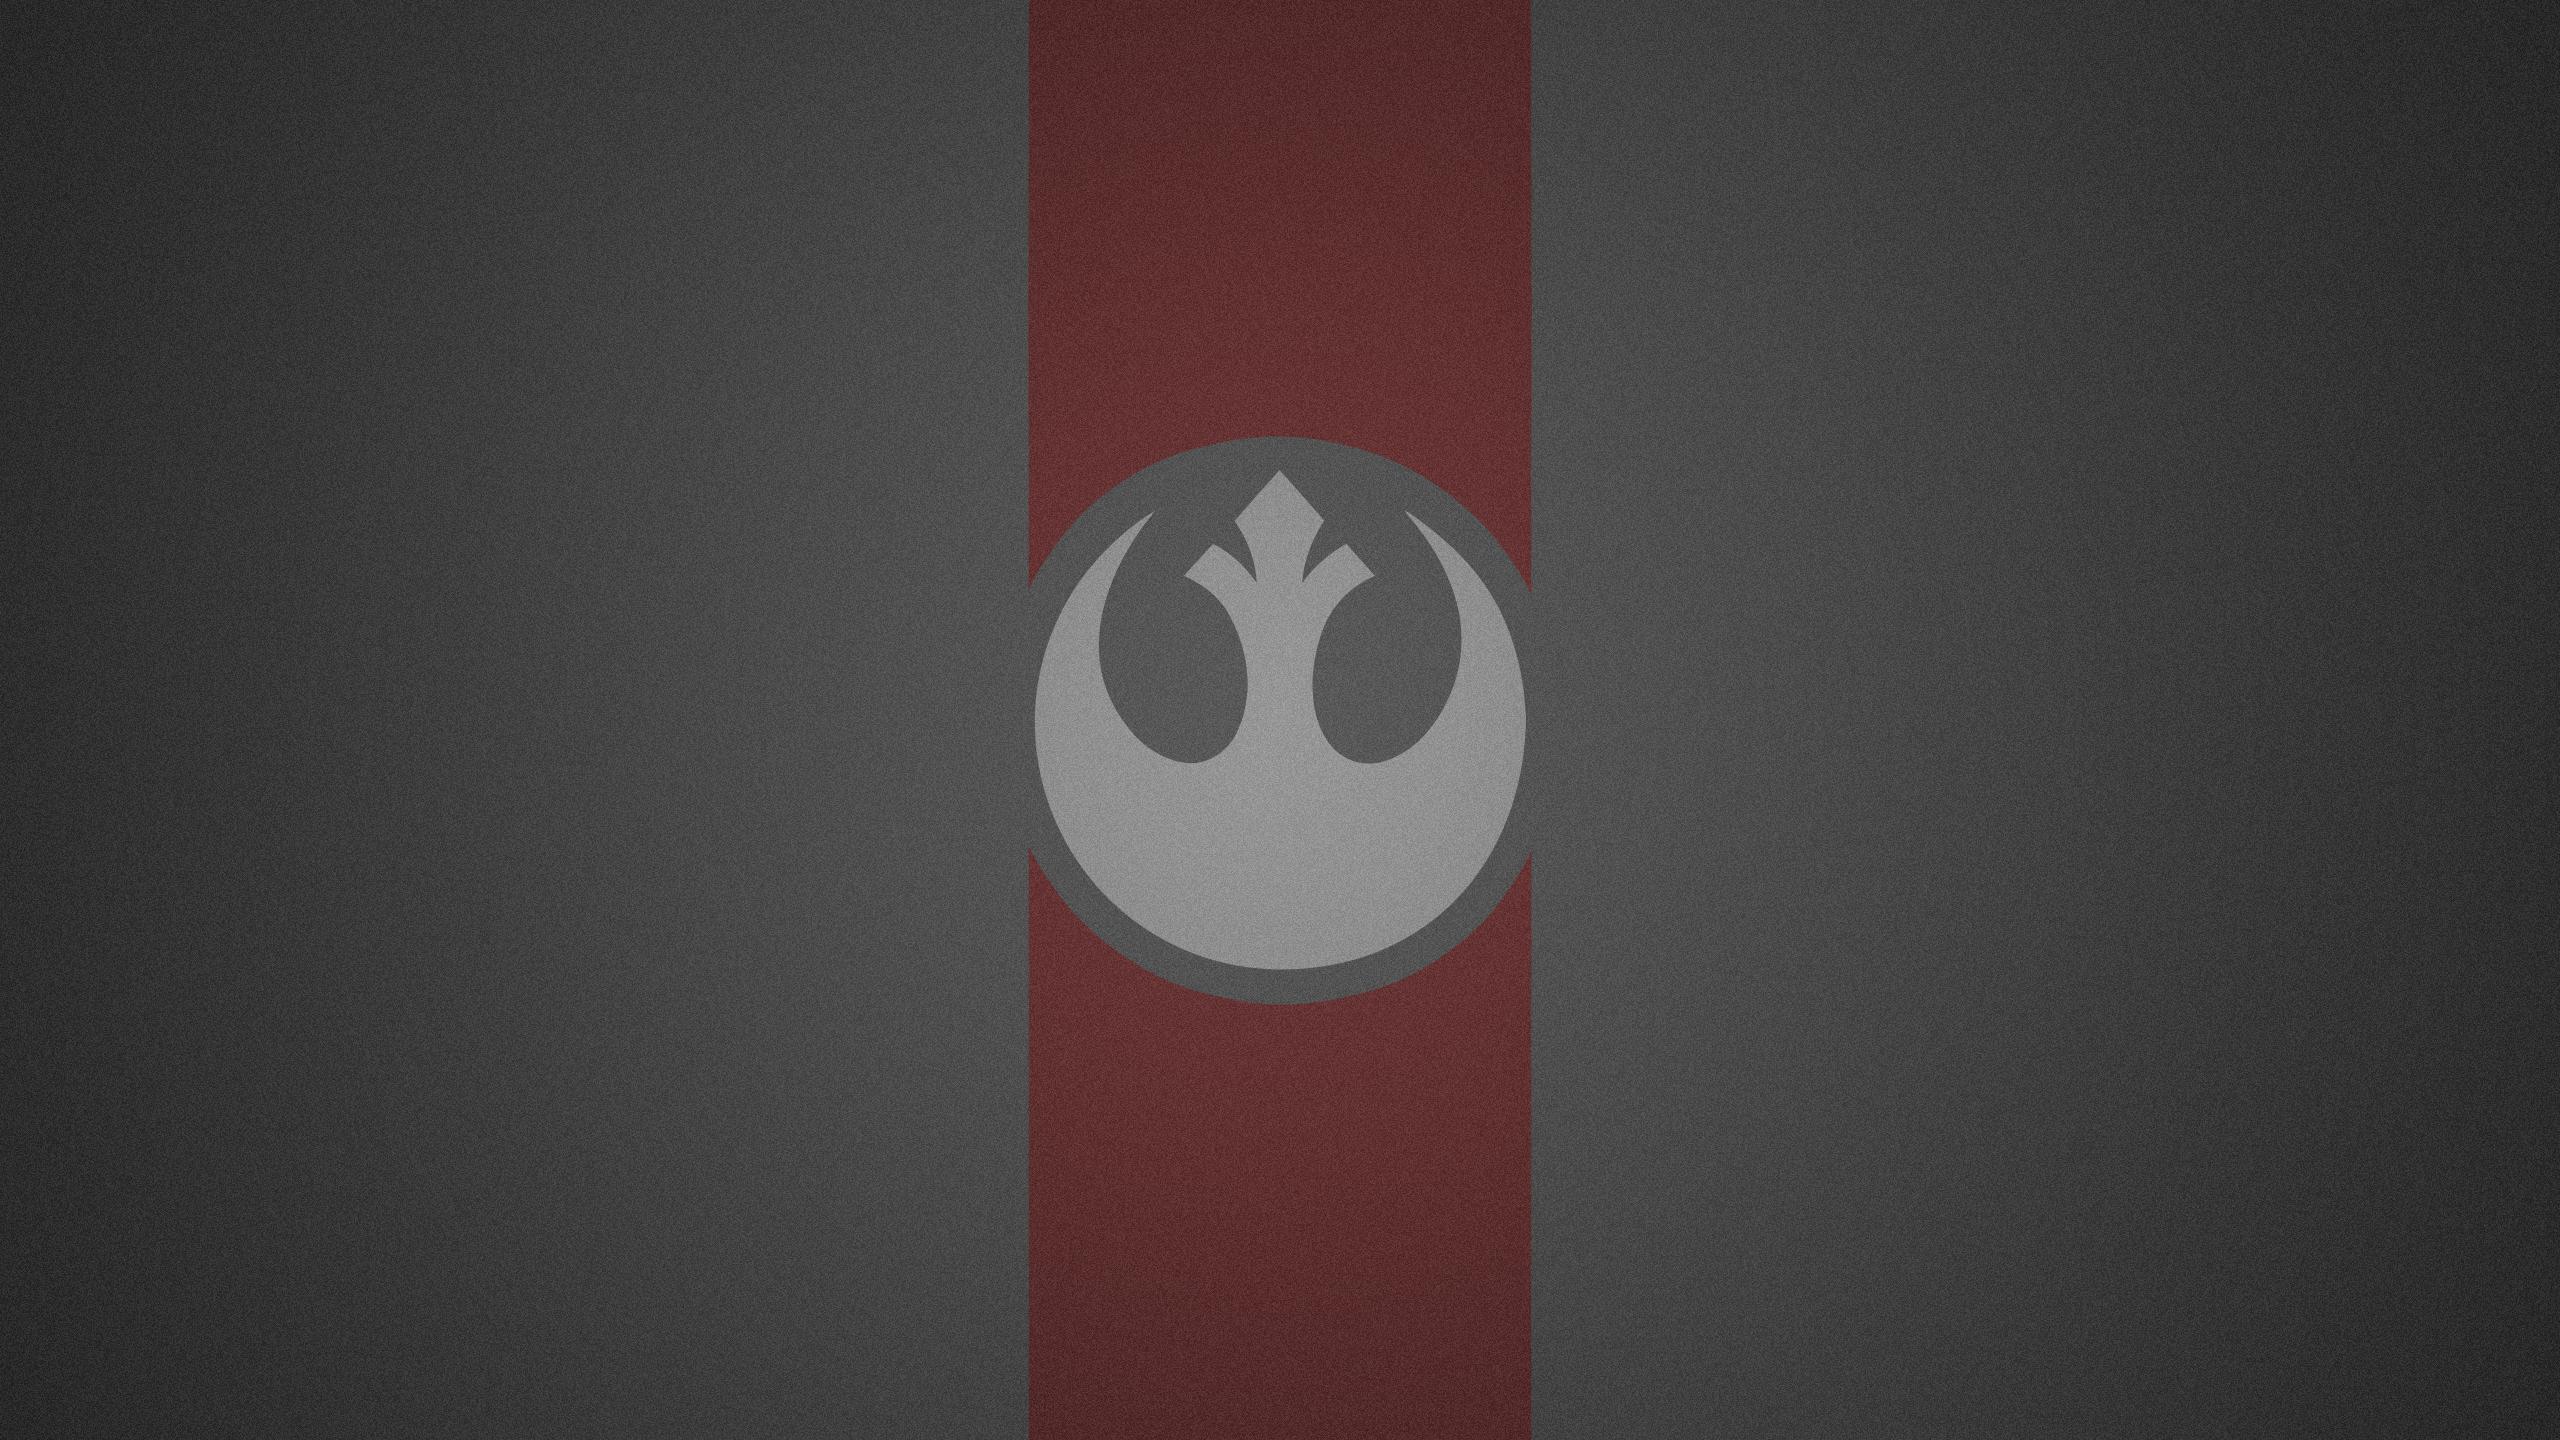 Rebel Alliance Wallpapers Wallpaper Cave